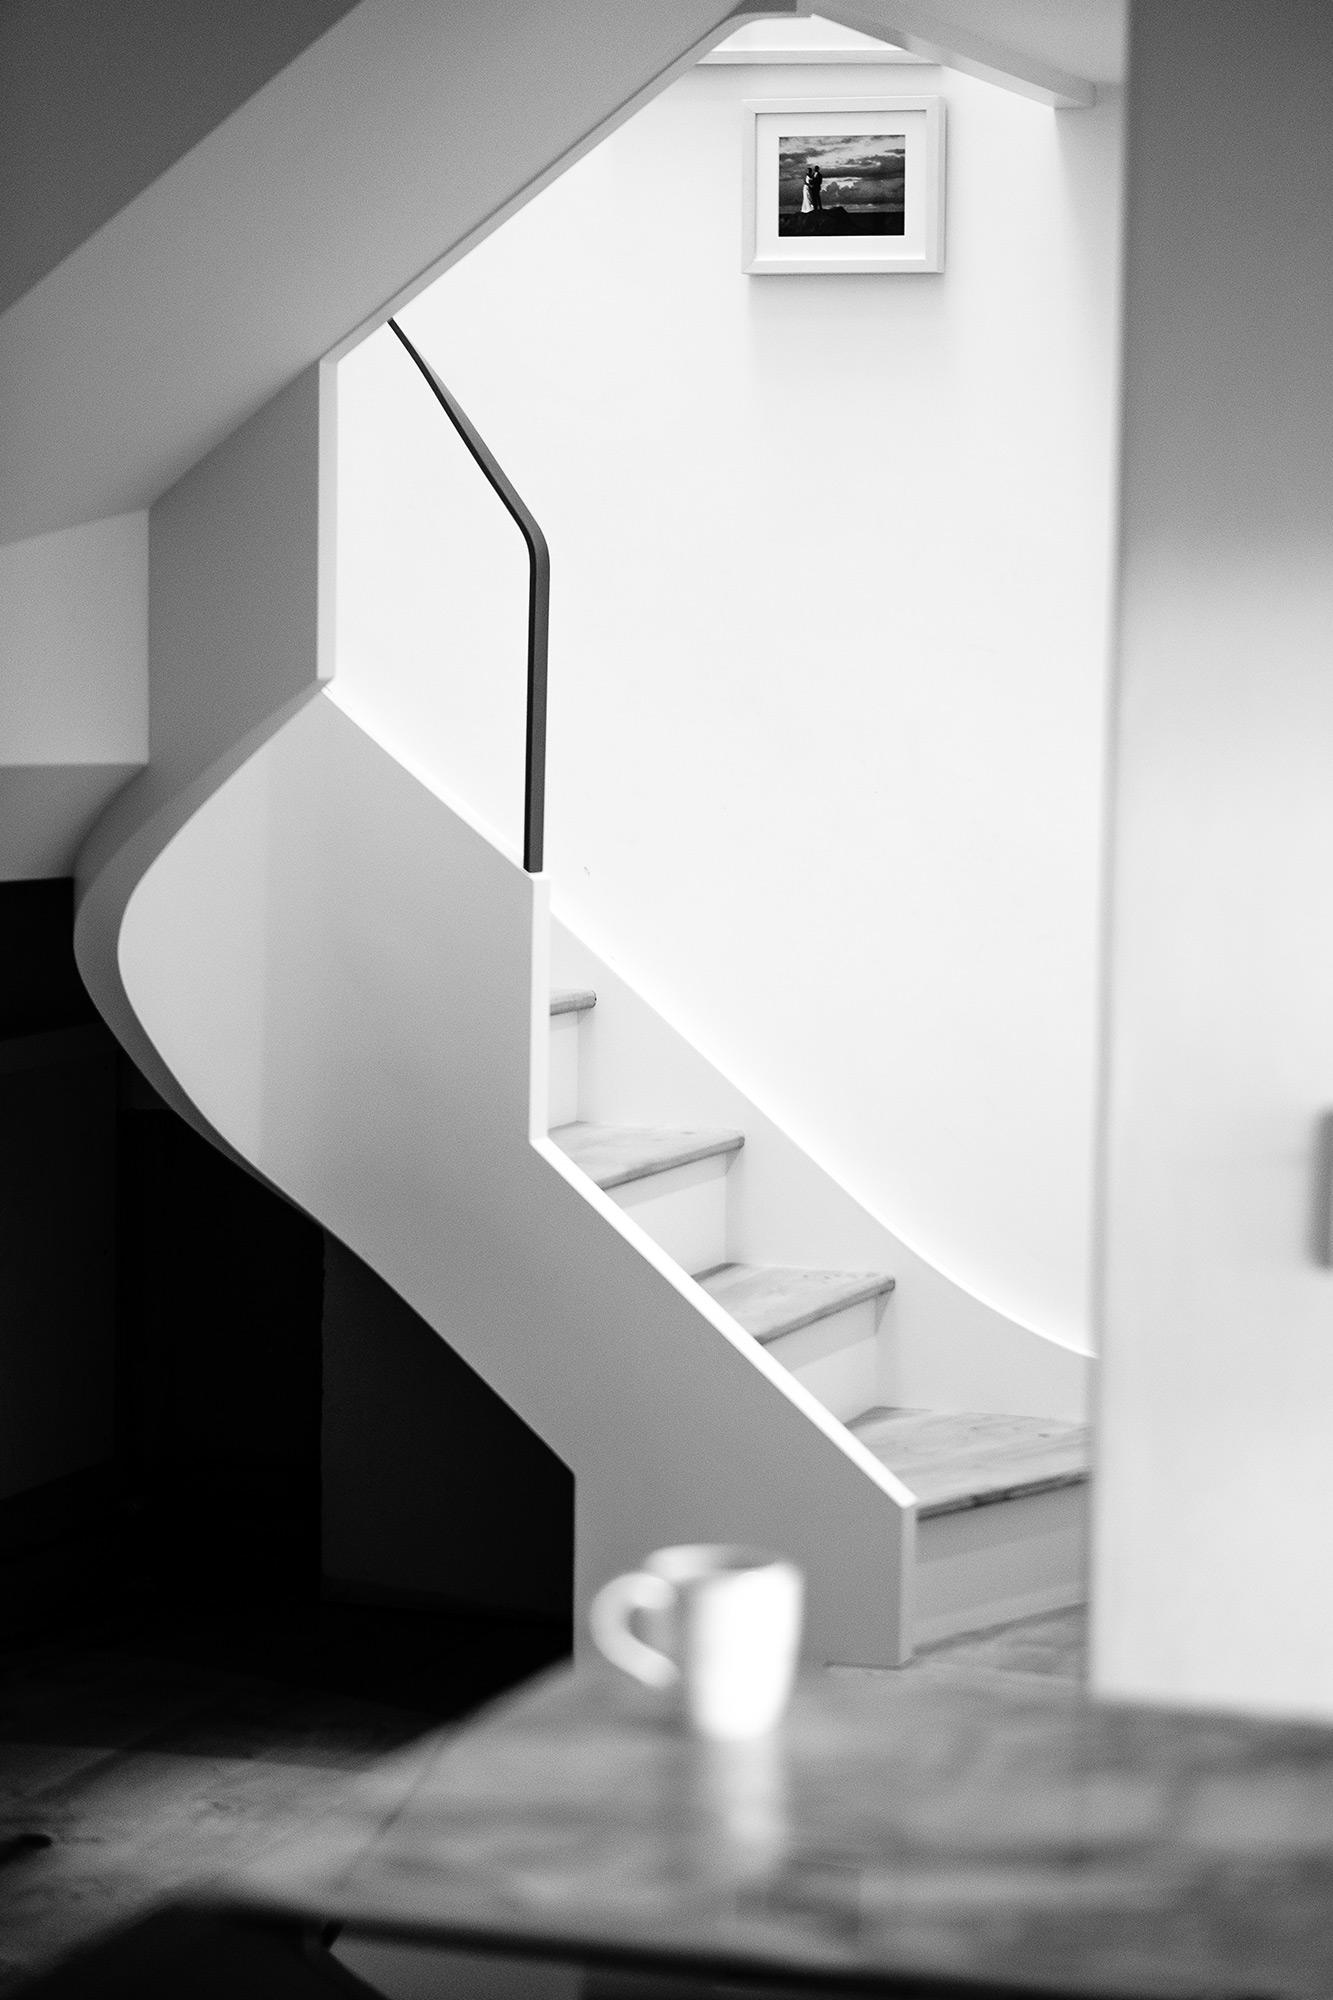 Alex+Accleton+Staircase+Joinery+2017+Matty+Snelling+01.jpg